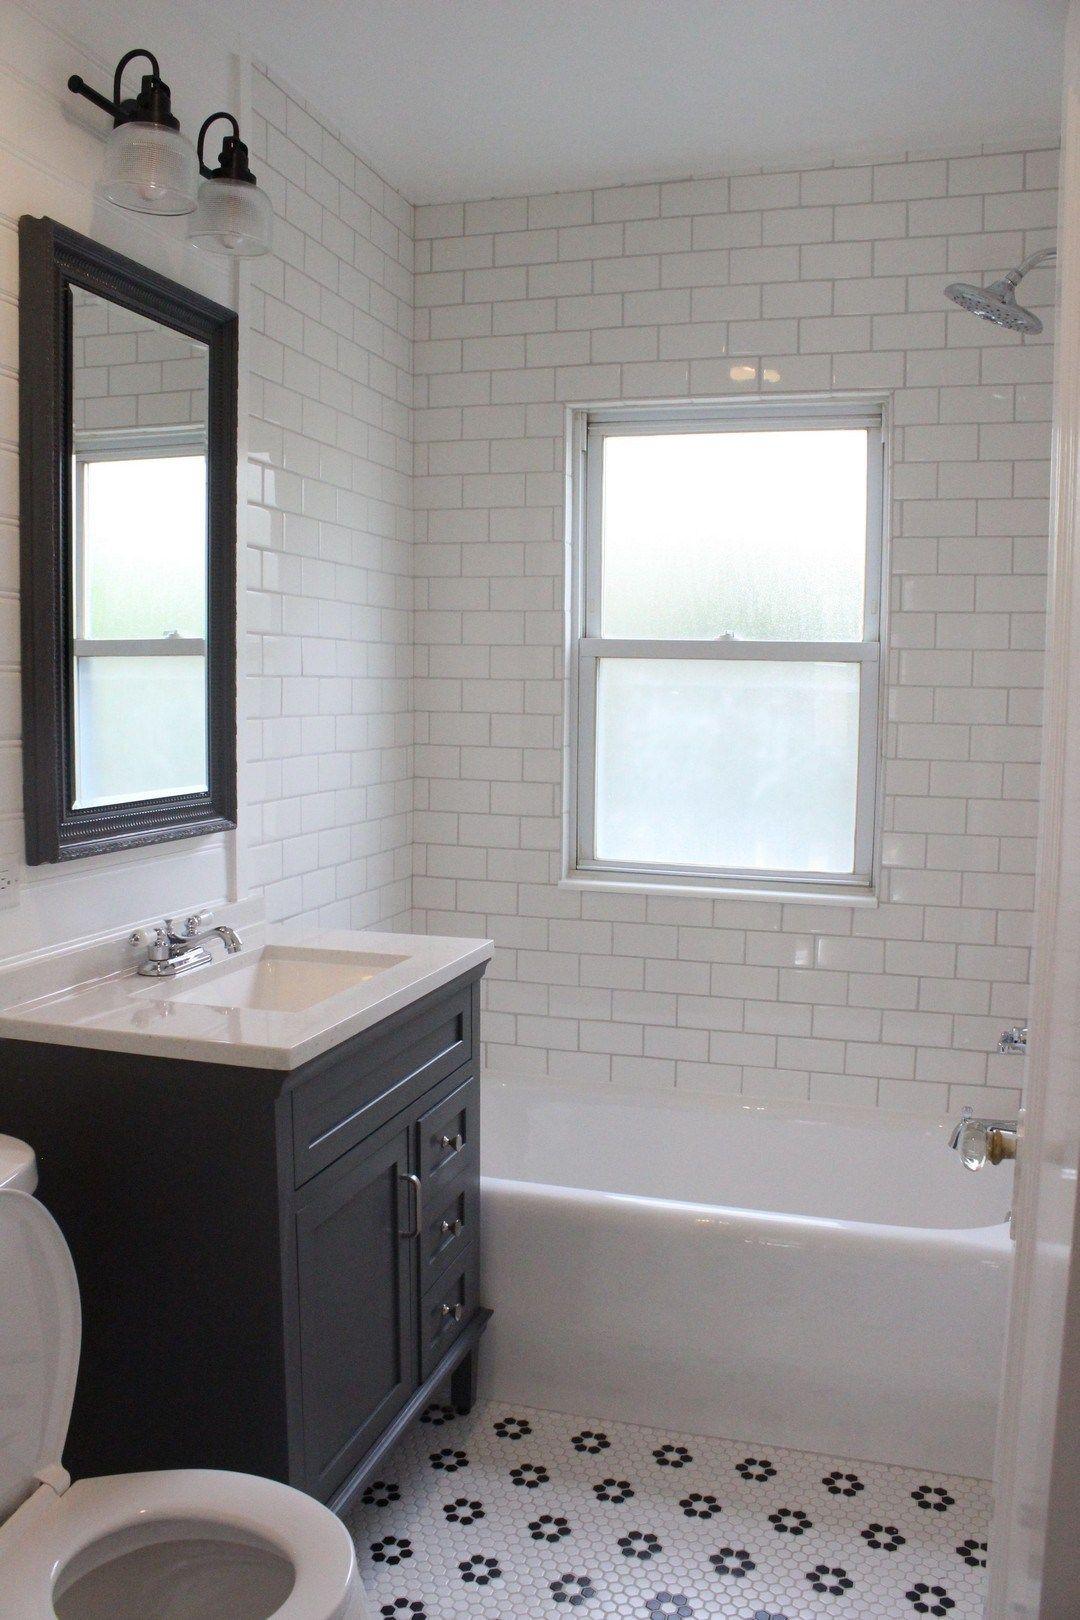 Gorgeous Black And White Subway Tiles Bathroom Design 7 White Bathroom Tiles Small Bathroom Remodel White Subway Tile Shower